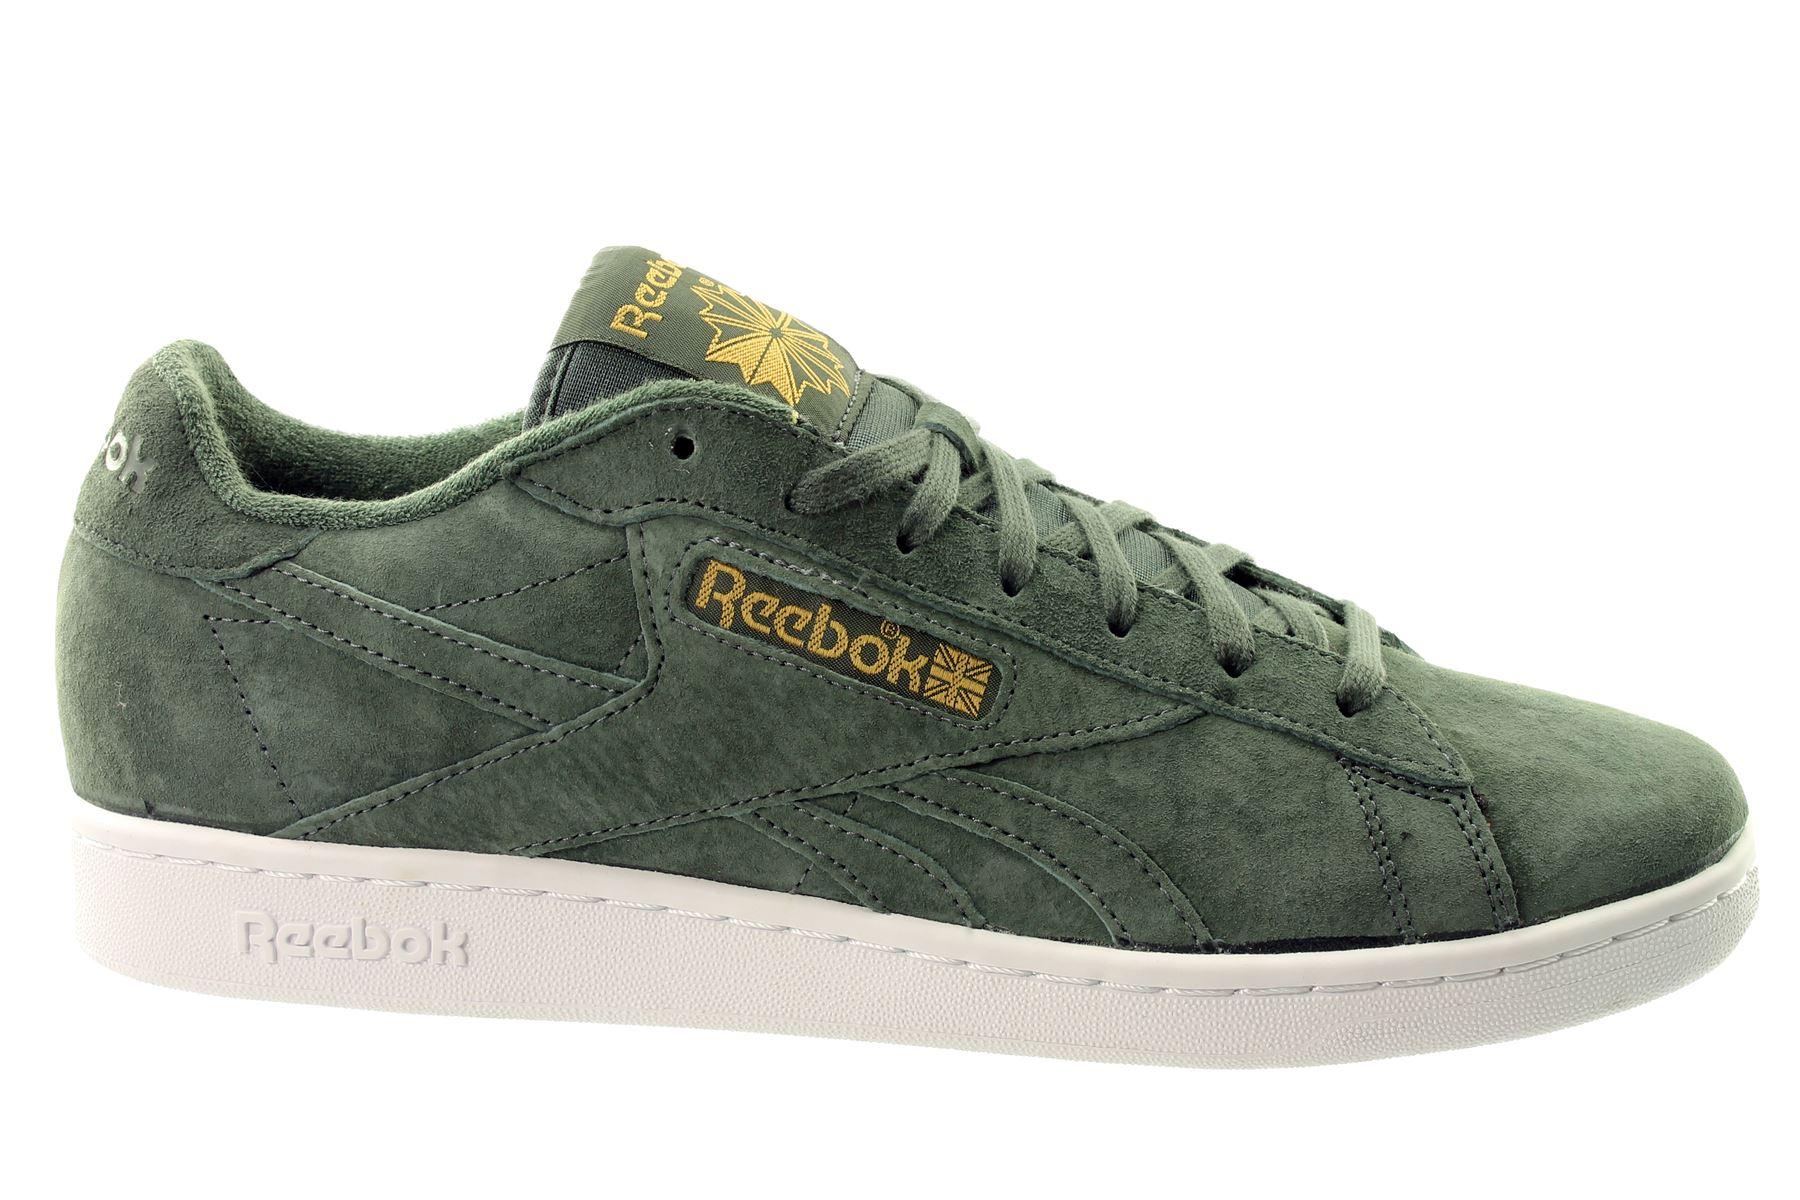 3f4f708abb8 reebok npc uk green sneakers